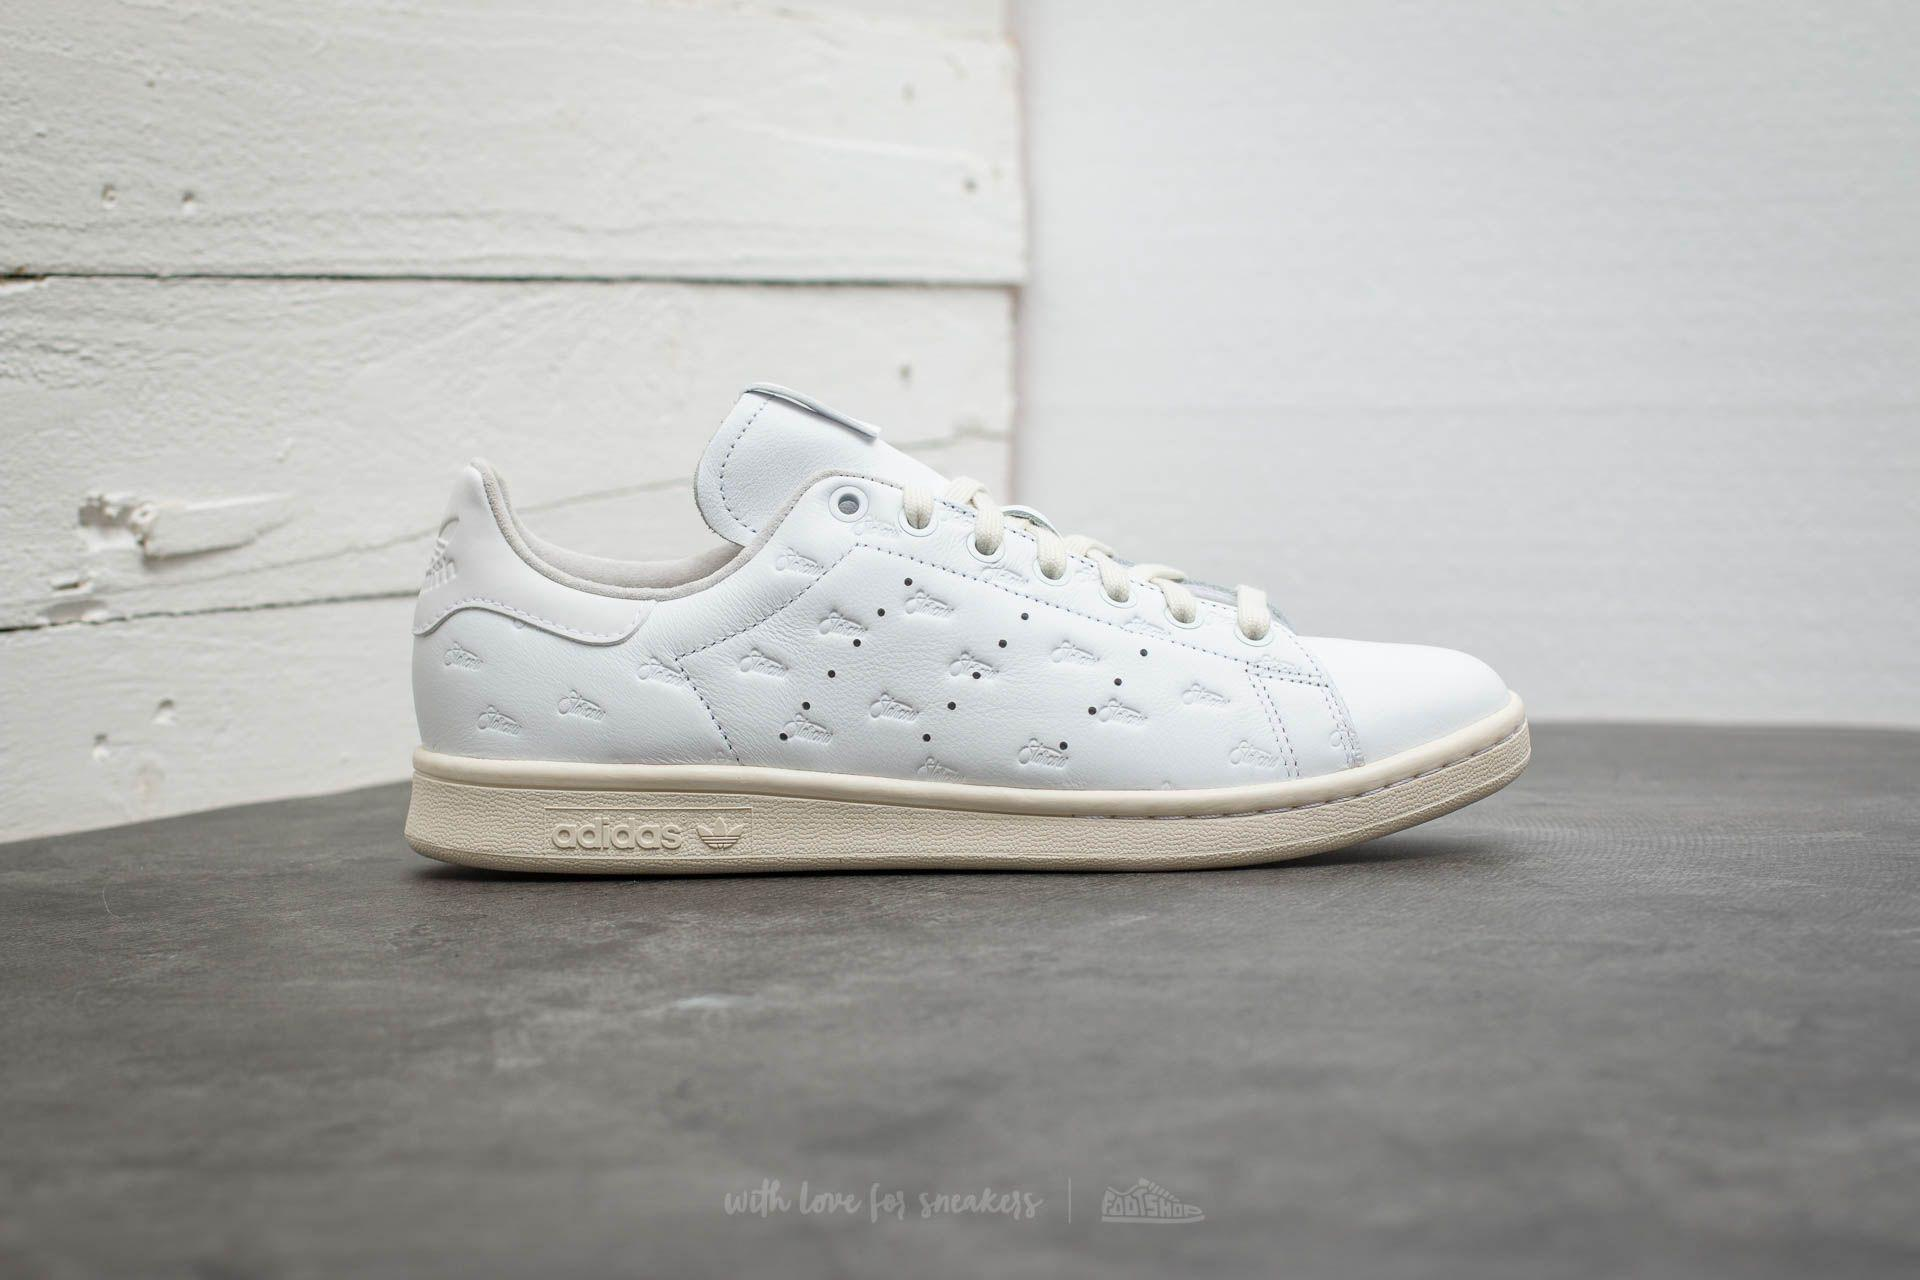 best cheap c412d cfec8 Lyst - Footshop Adidas Consortium X Alife X Starcow Stan Smi